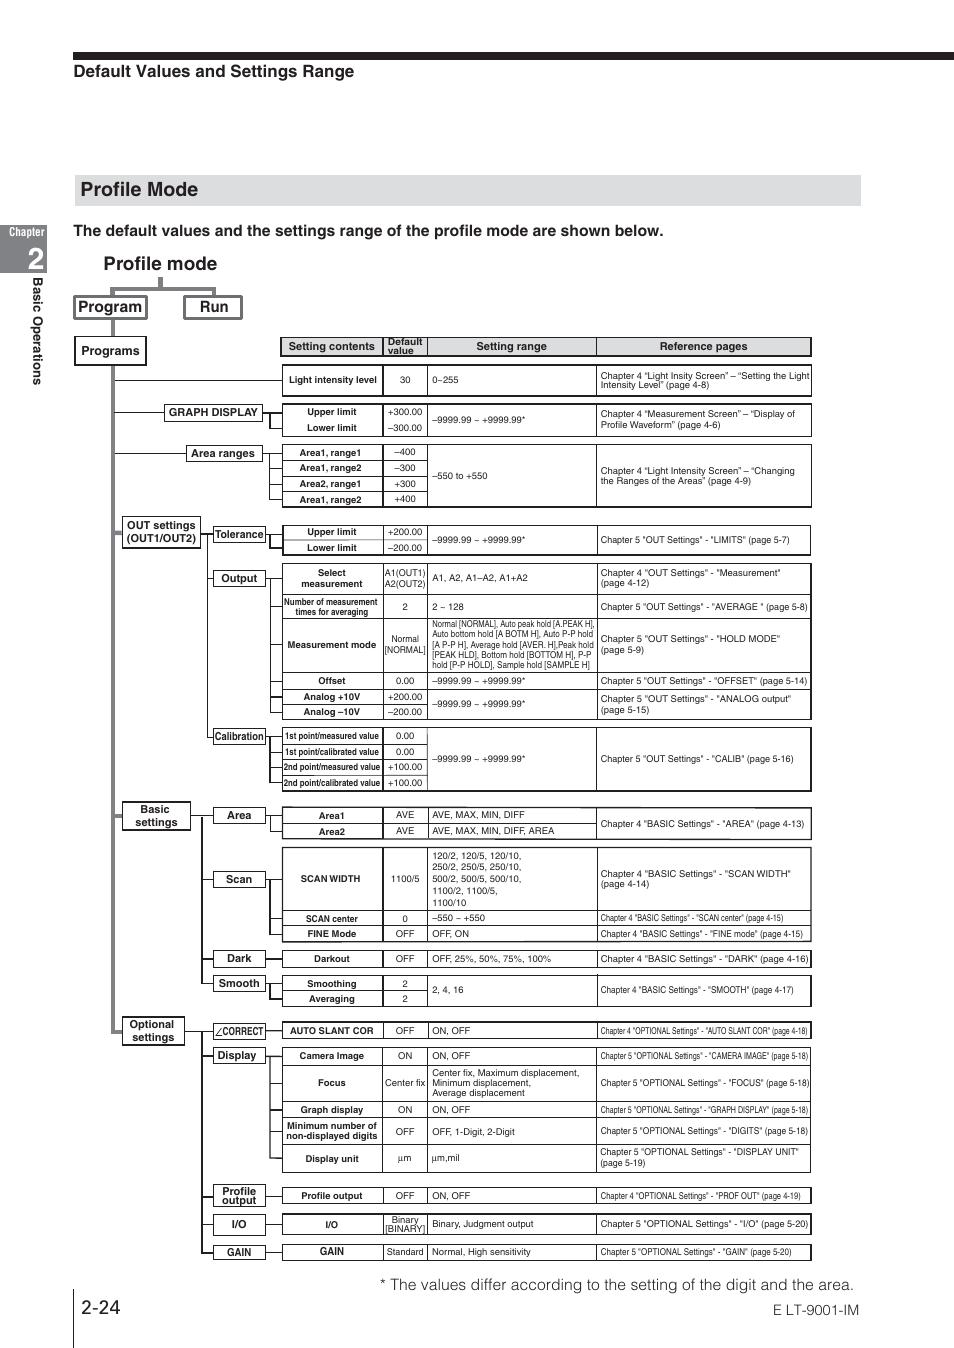 Profile mode, Default values and settings range, Program